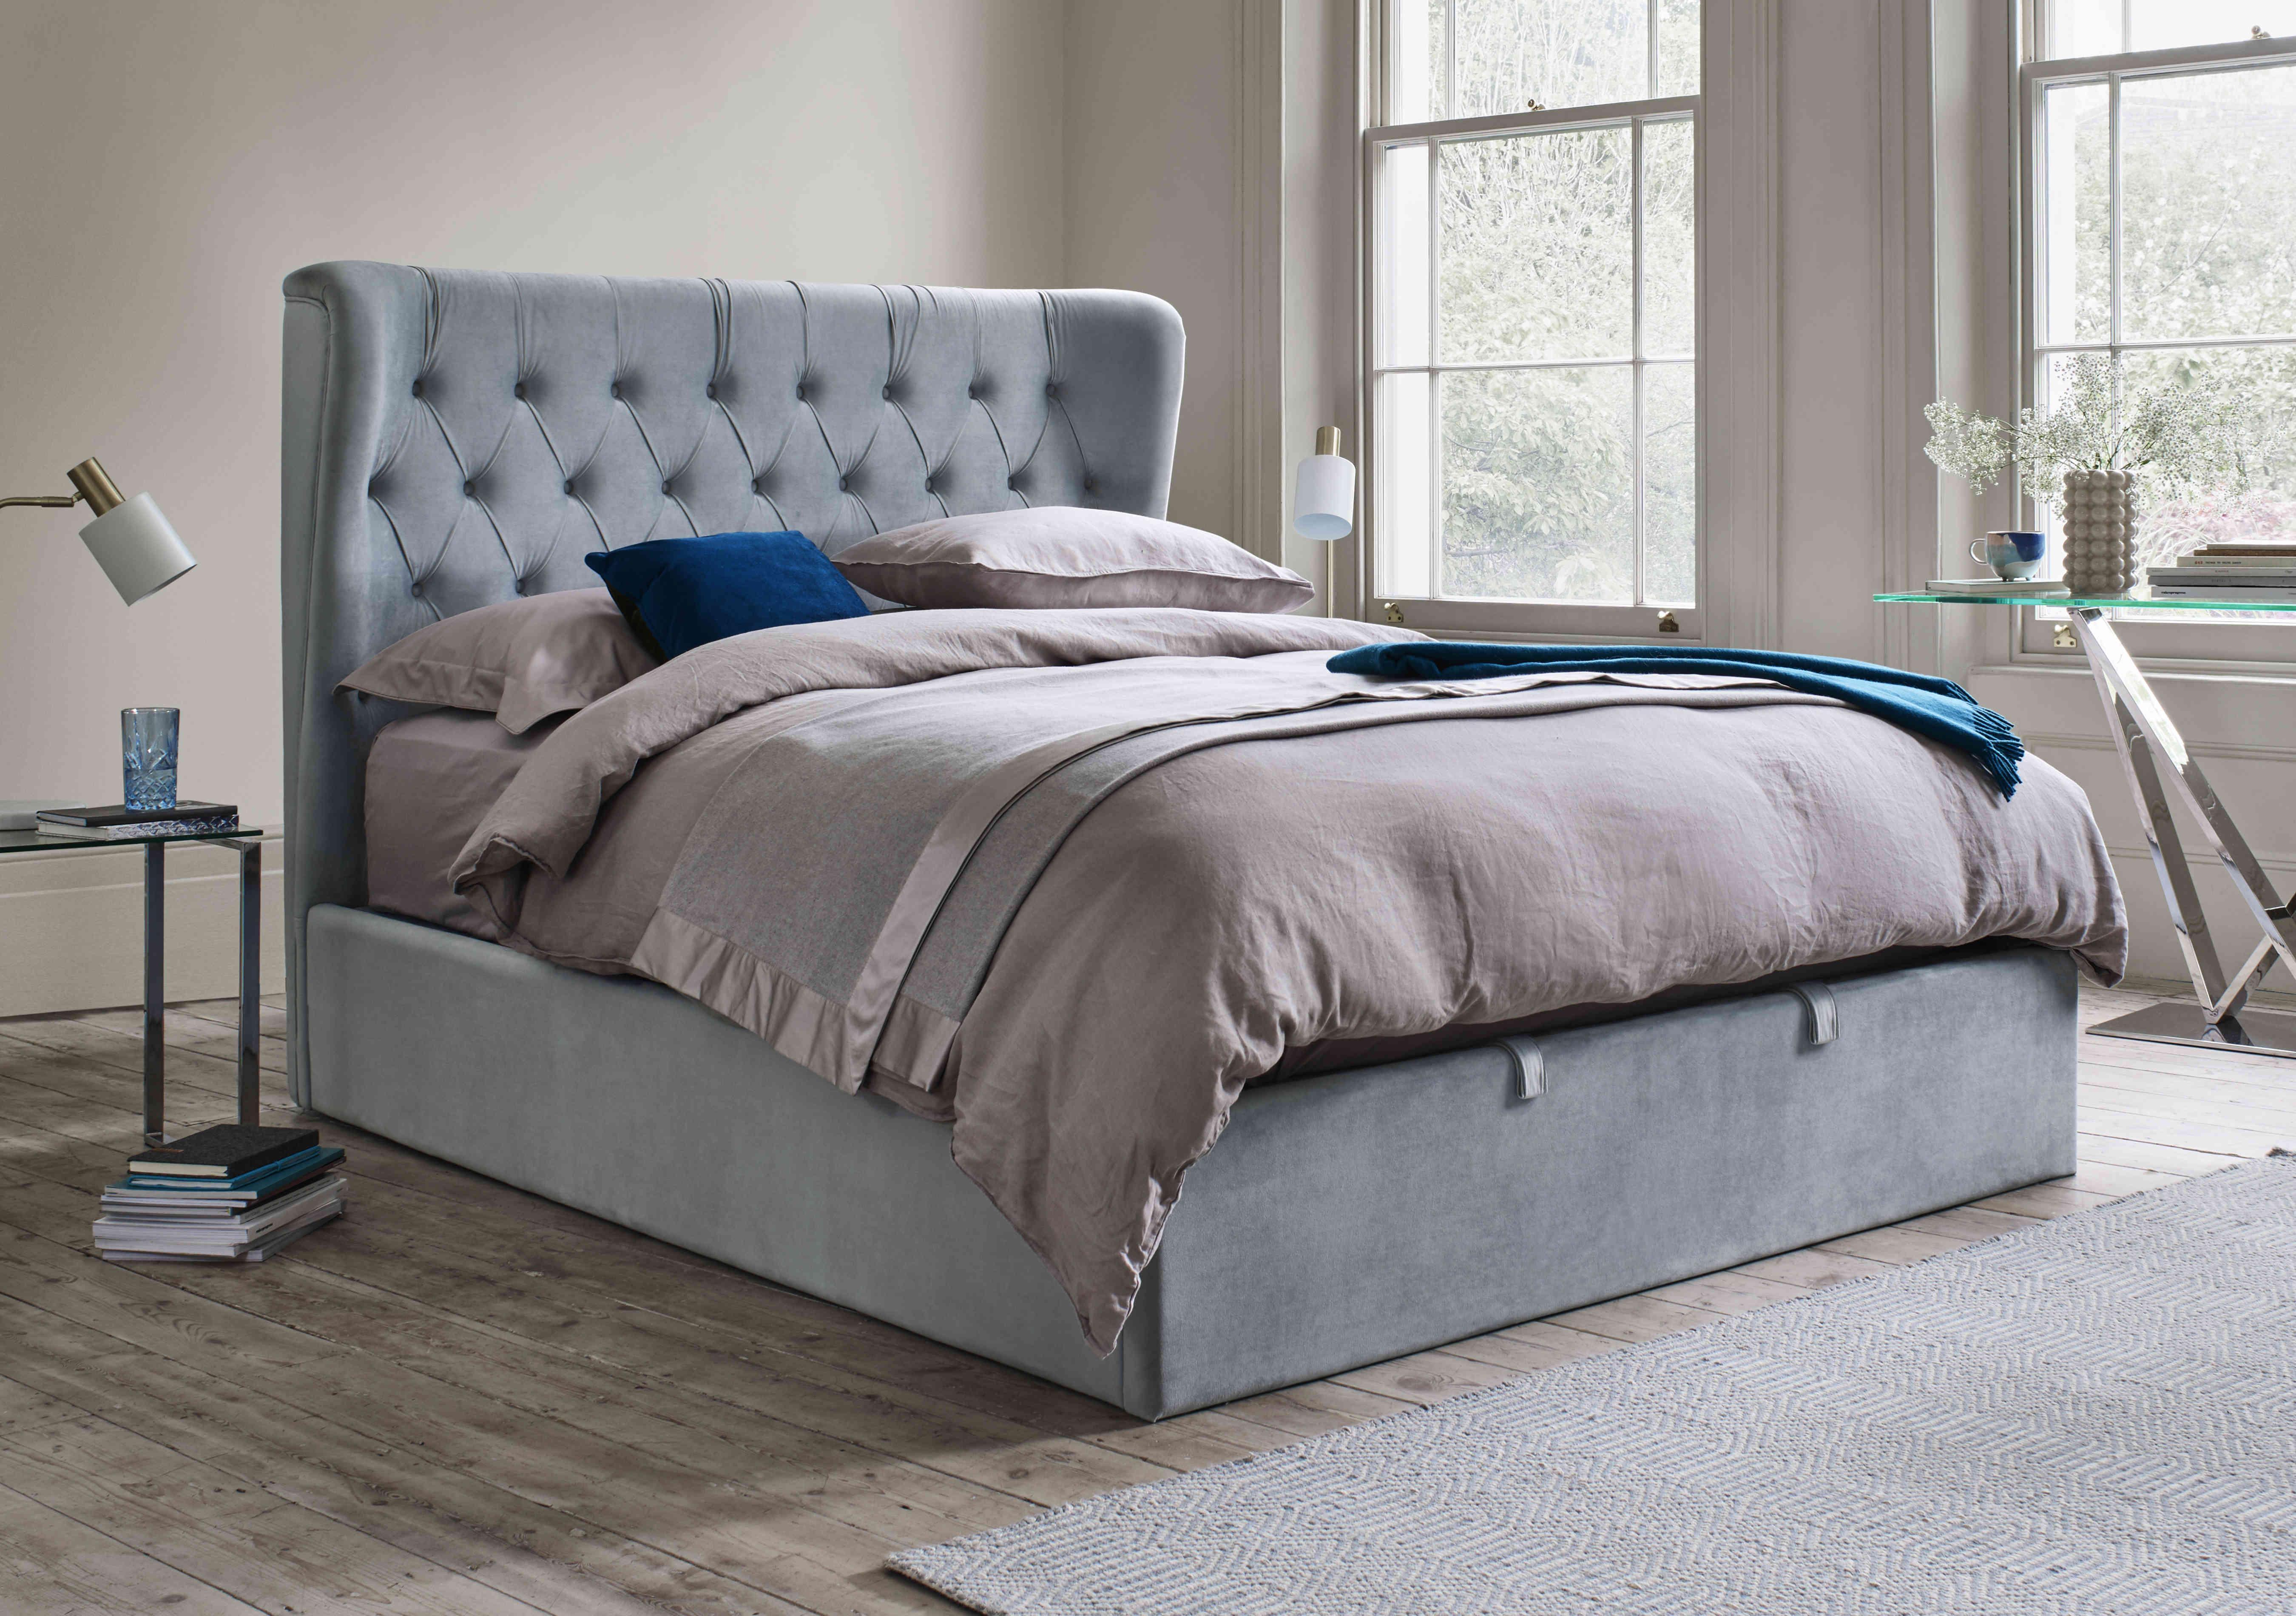 7 Beautiful Blue Bedroom Ideas Furniture Village Furniture Village